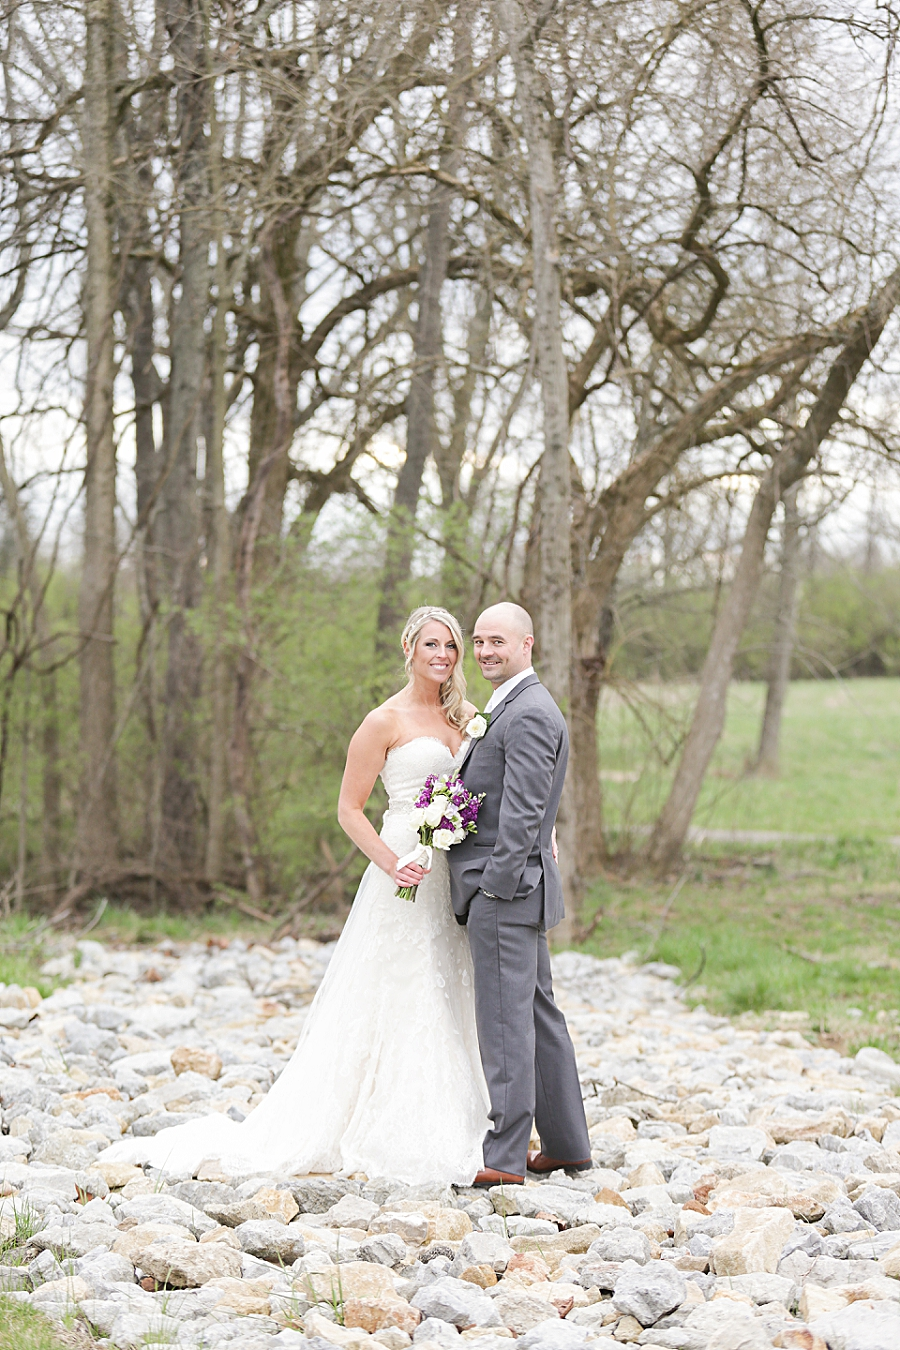 Cincinnati Wedding Photographer_We Are A Story_Kristen & Corey_2671.jpg